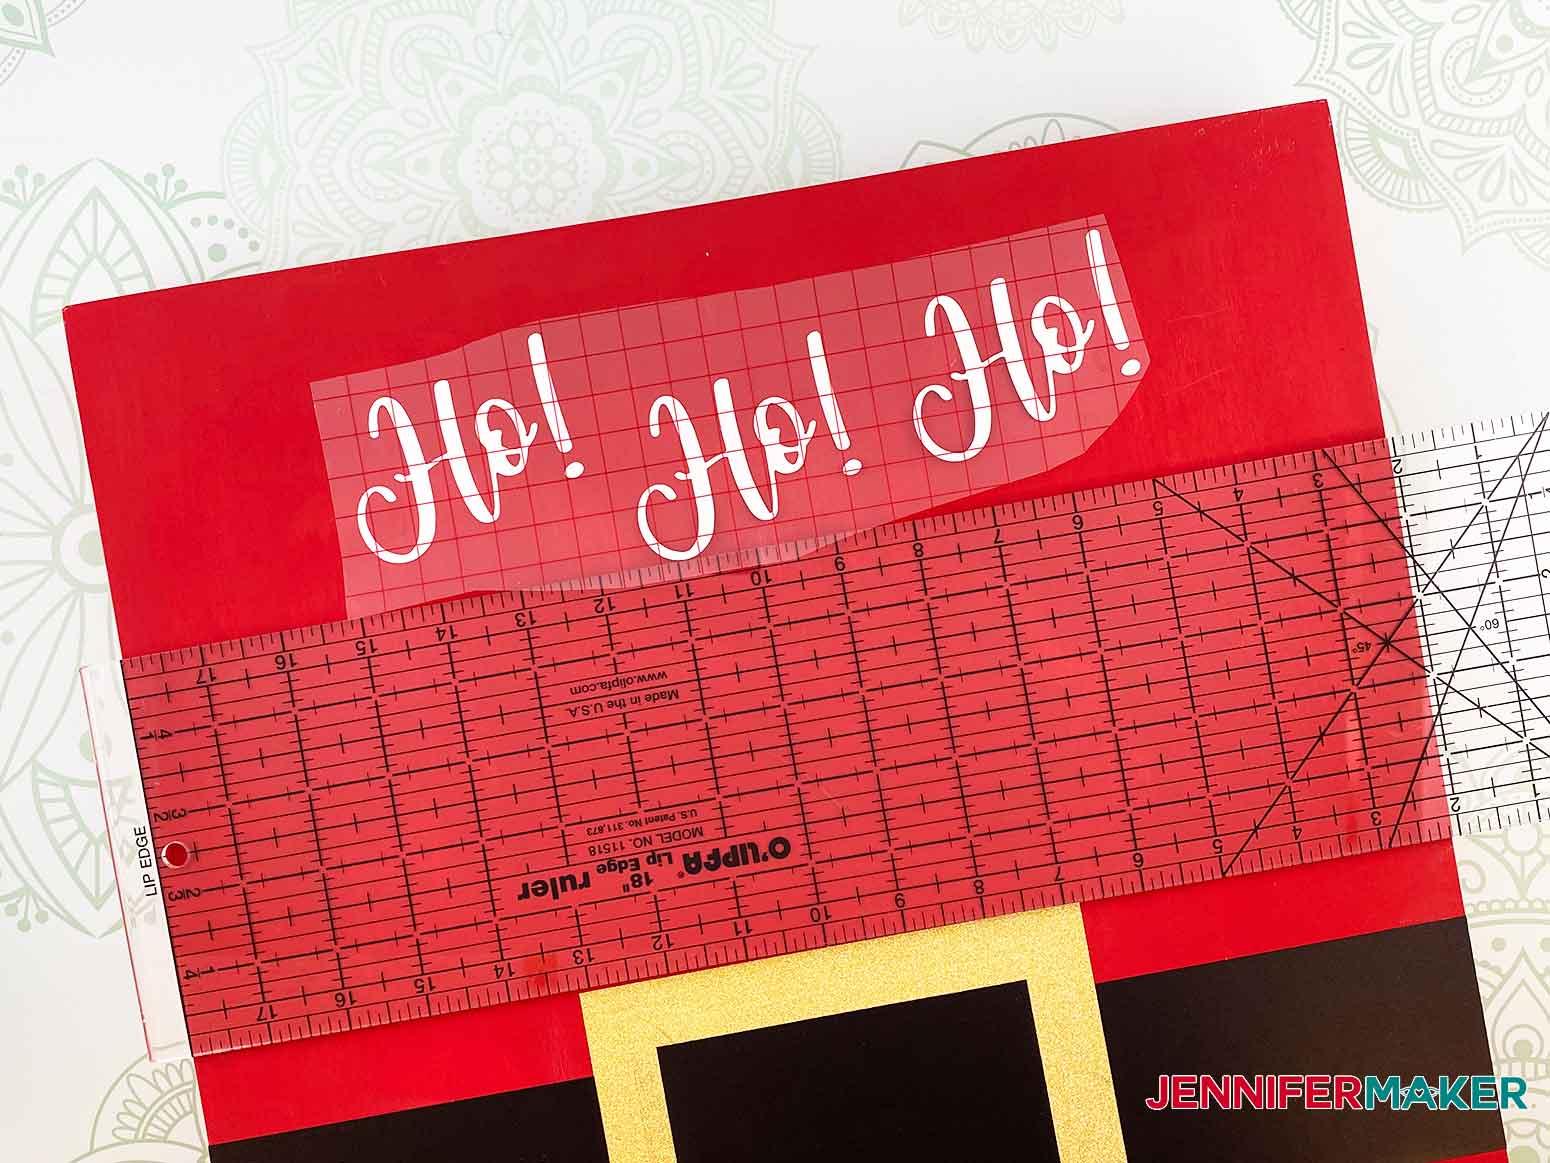 Place Ho! Ho! Ho! vinyl on the Christmas Countdown Sign